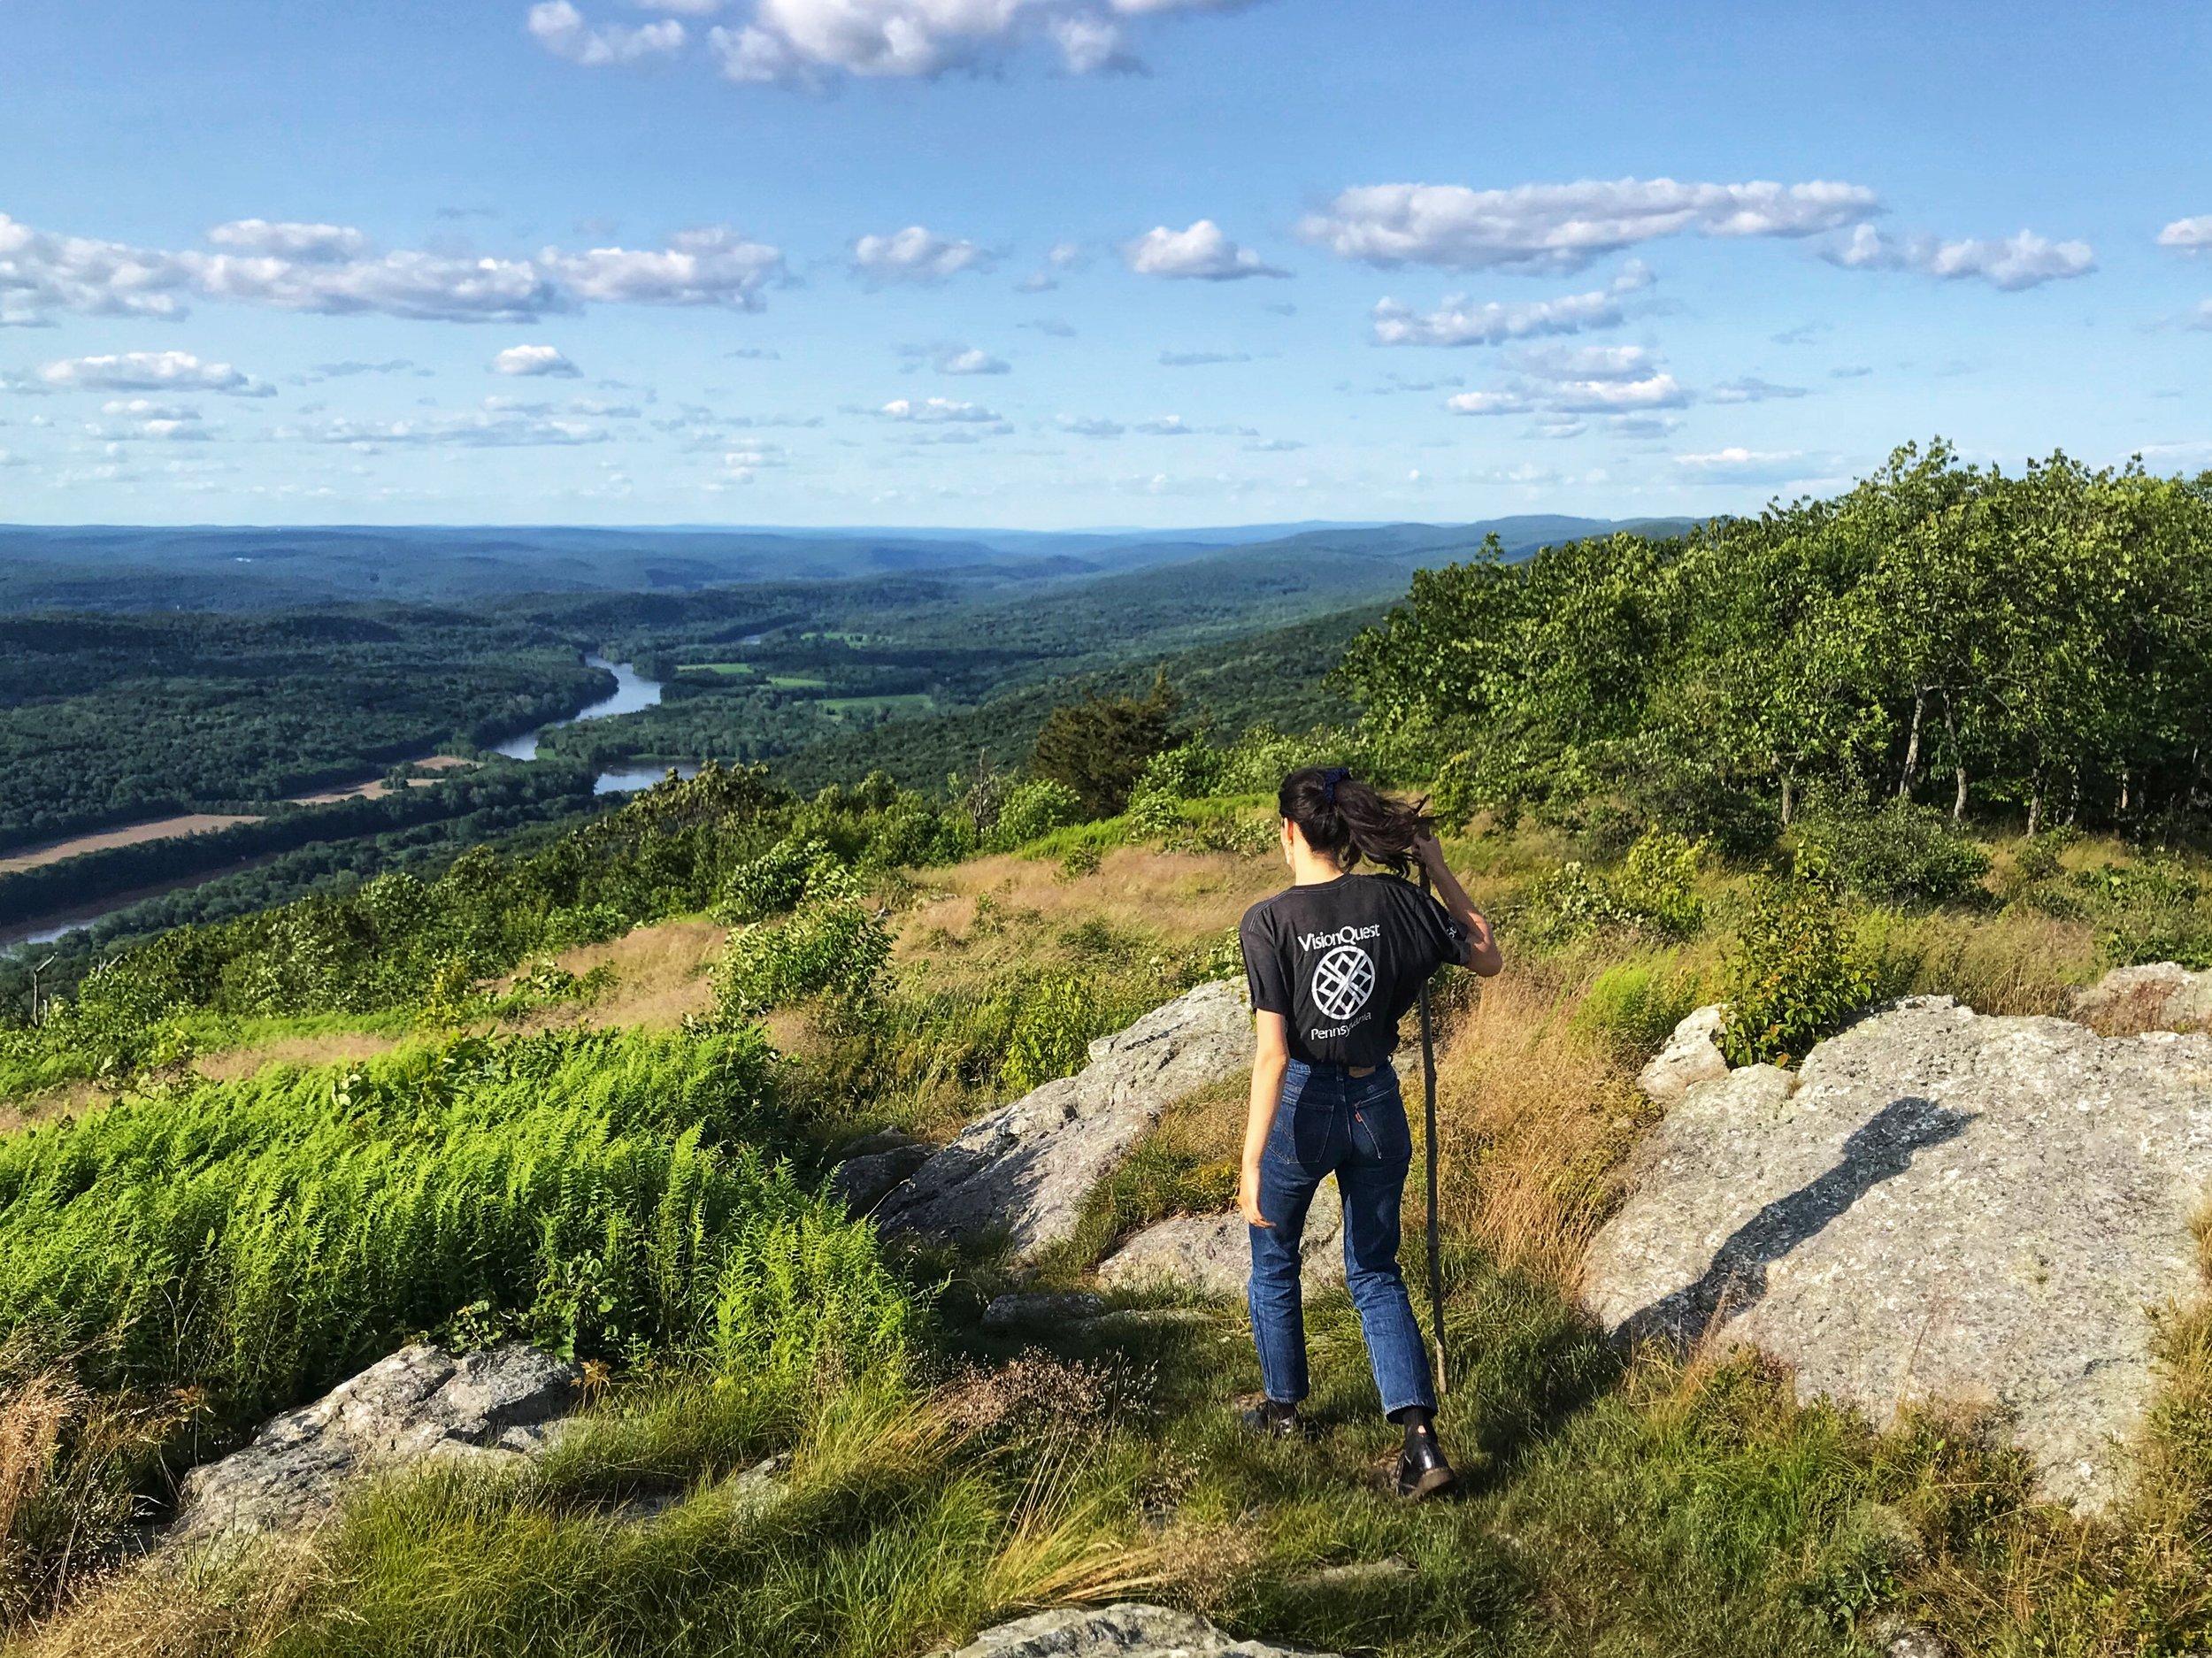 Pre-trip hike. Appalachian Trail, Sussex County, NJ.